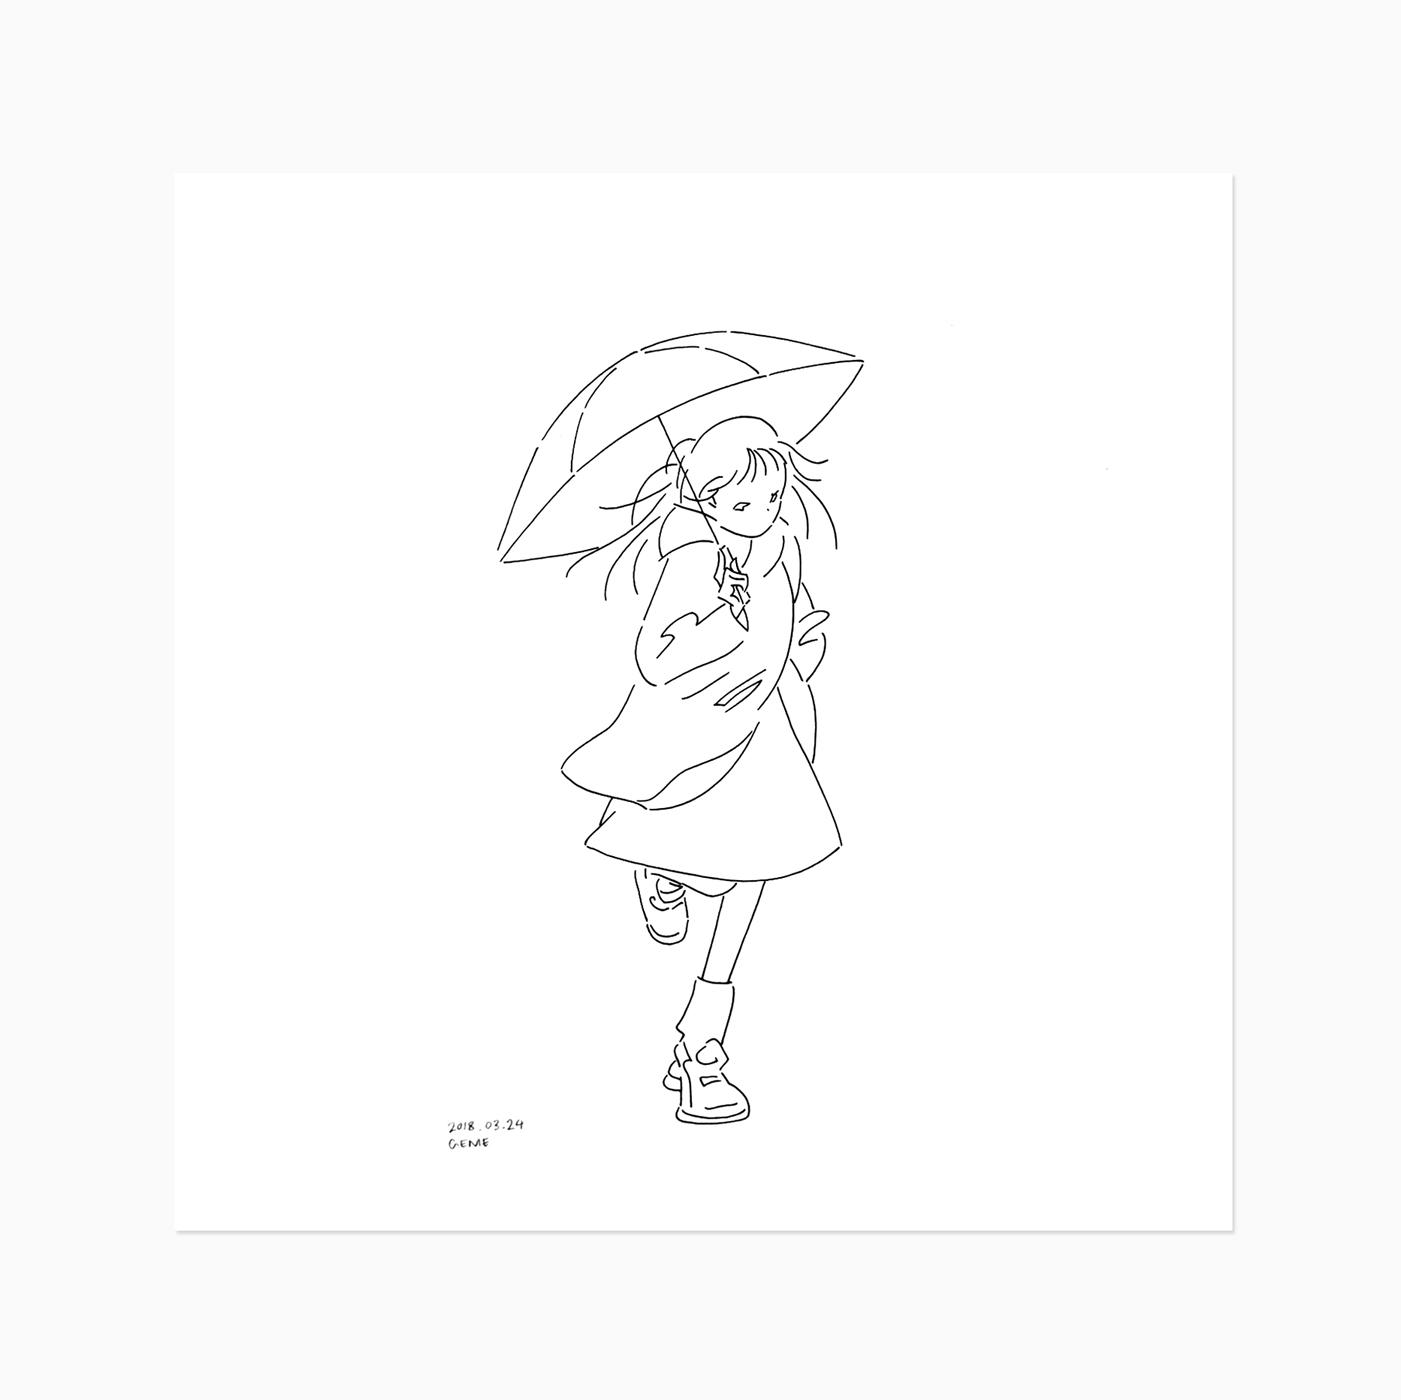 GN_CO_IL_FS_2018-03_ink_umbrella-girl-1400x1400.jpg